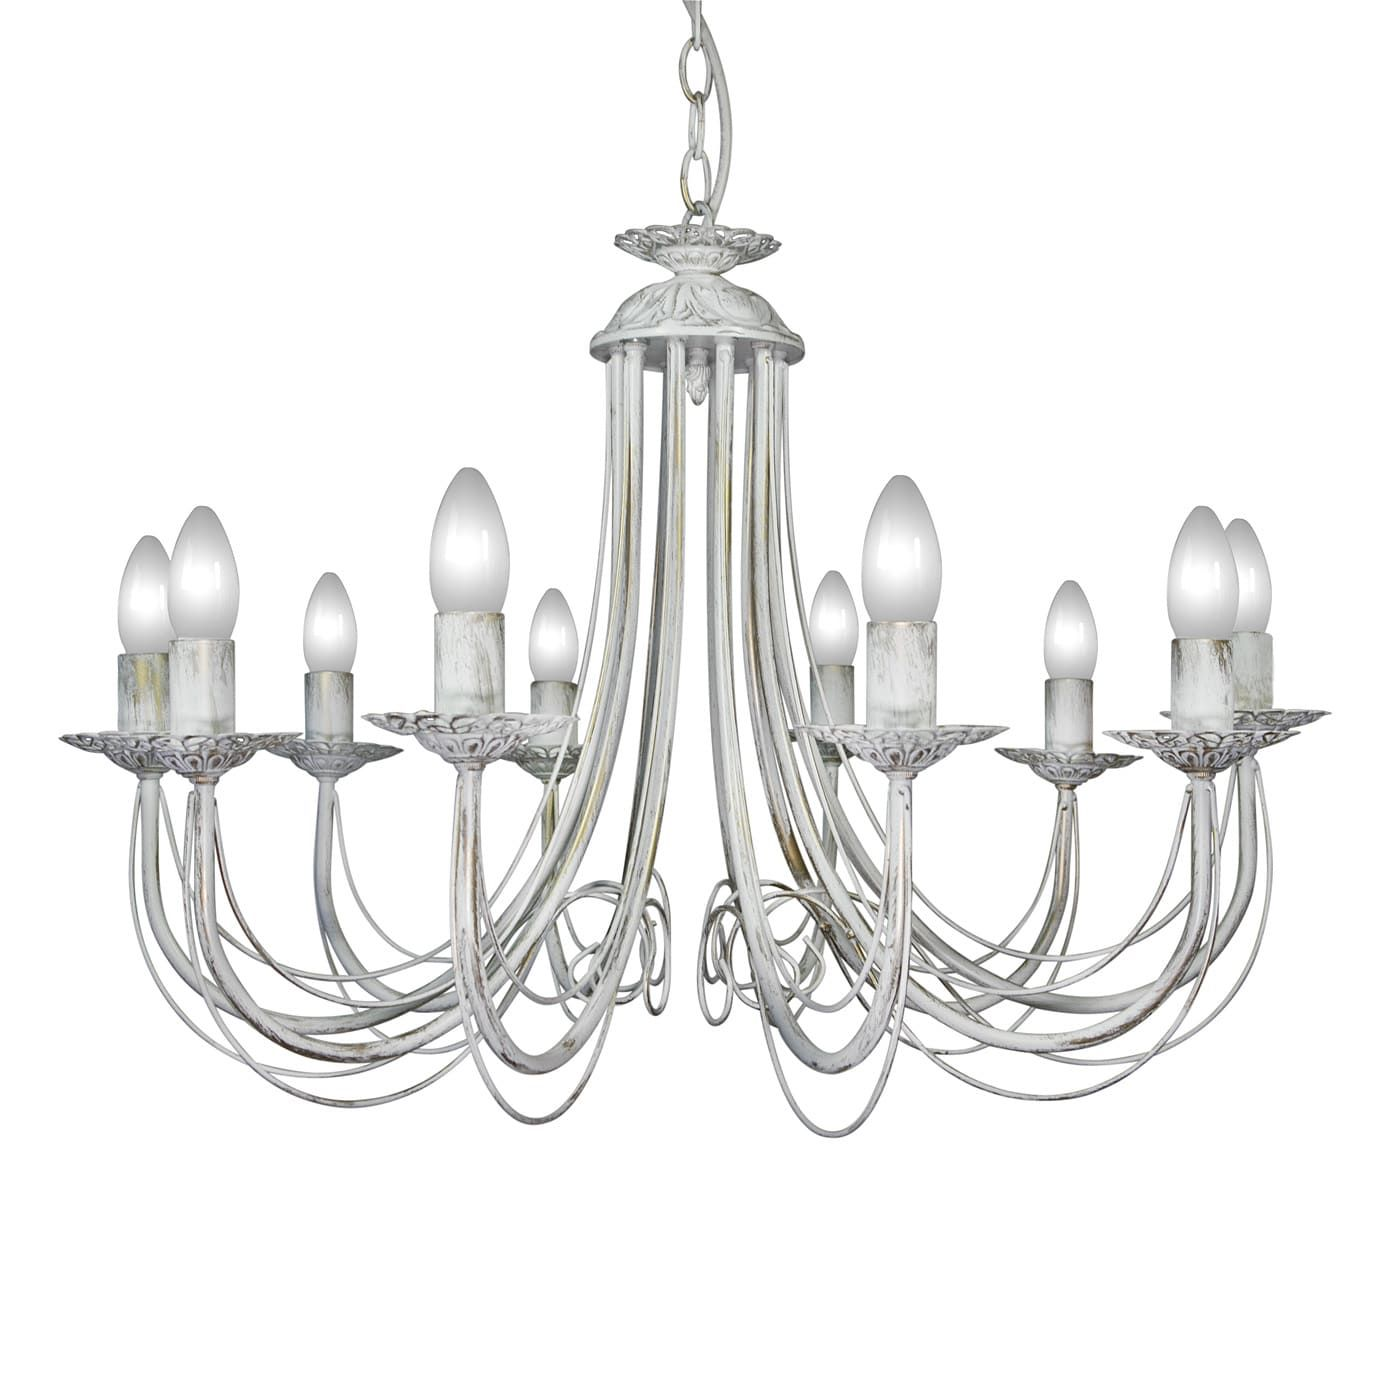 PETRASVET / Pendant chandelier S1165-10, 10xE14 max. 60W